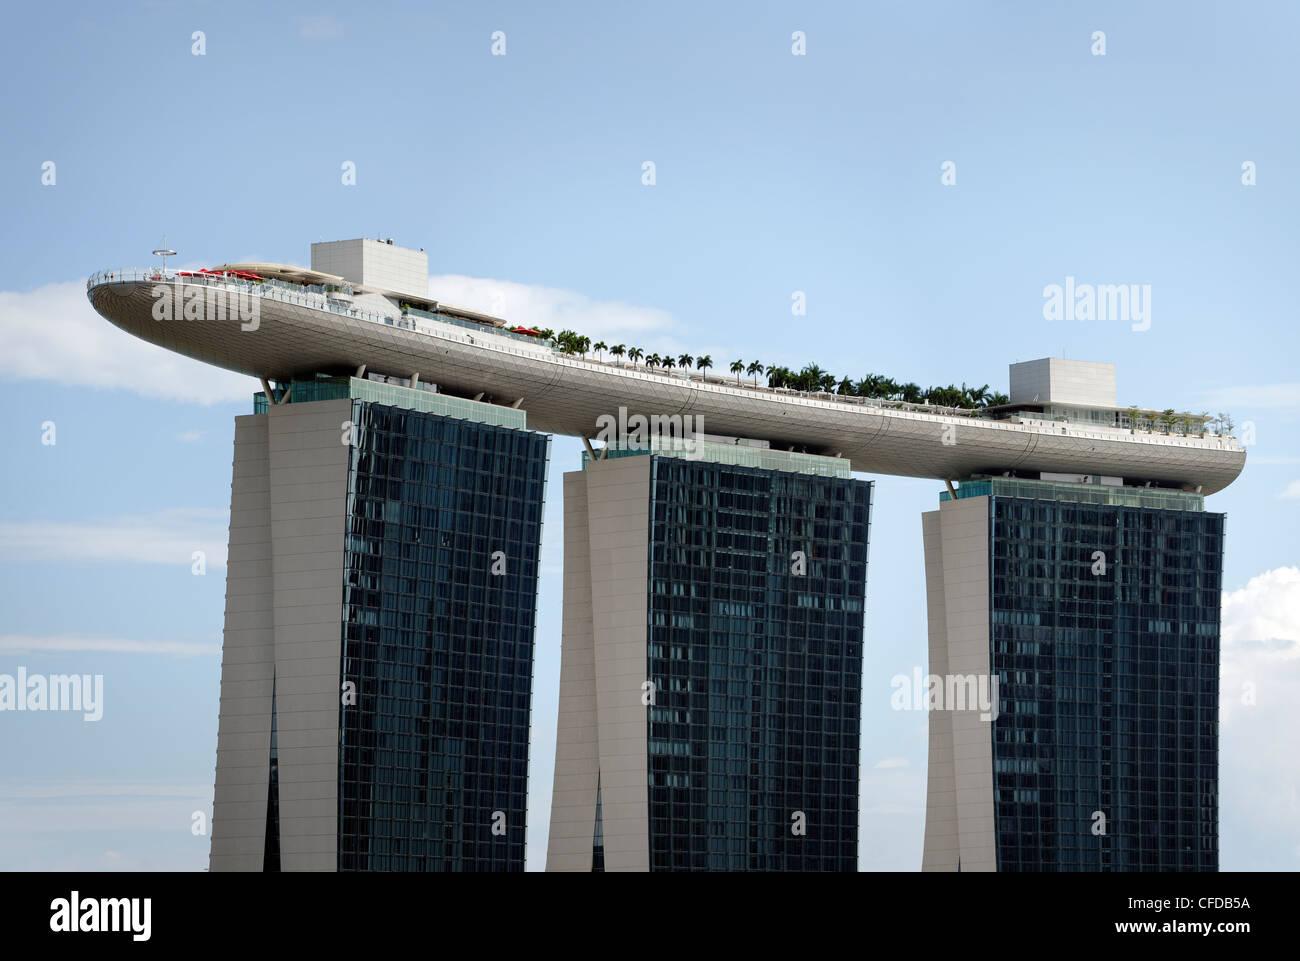 Marina Bay Sands, Singapore - Stock Image